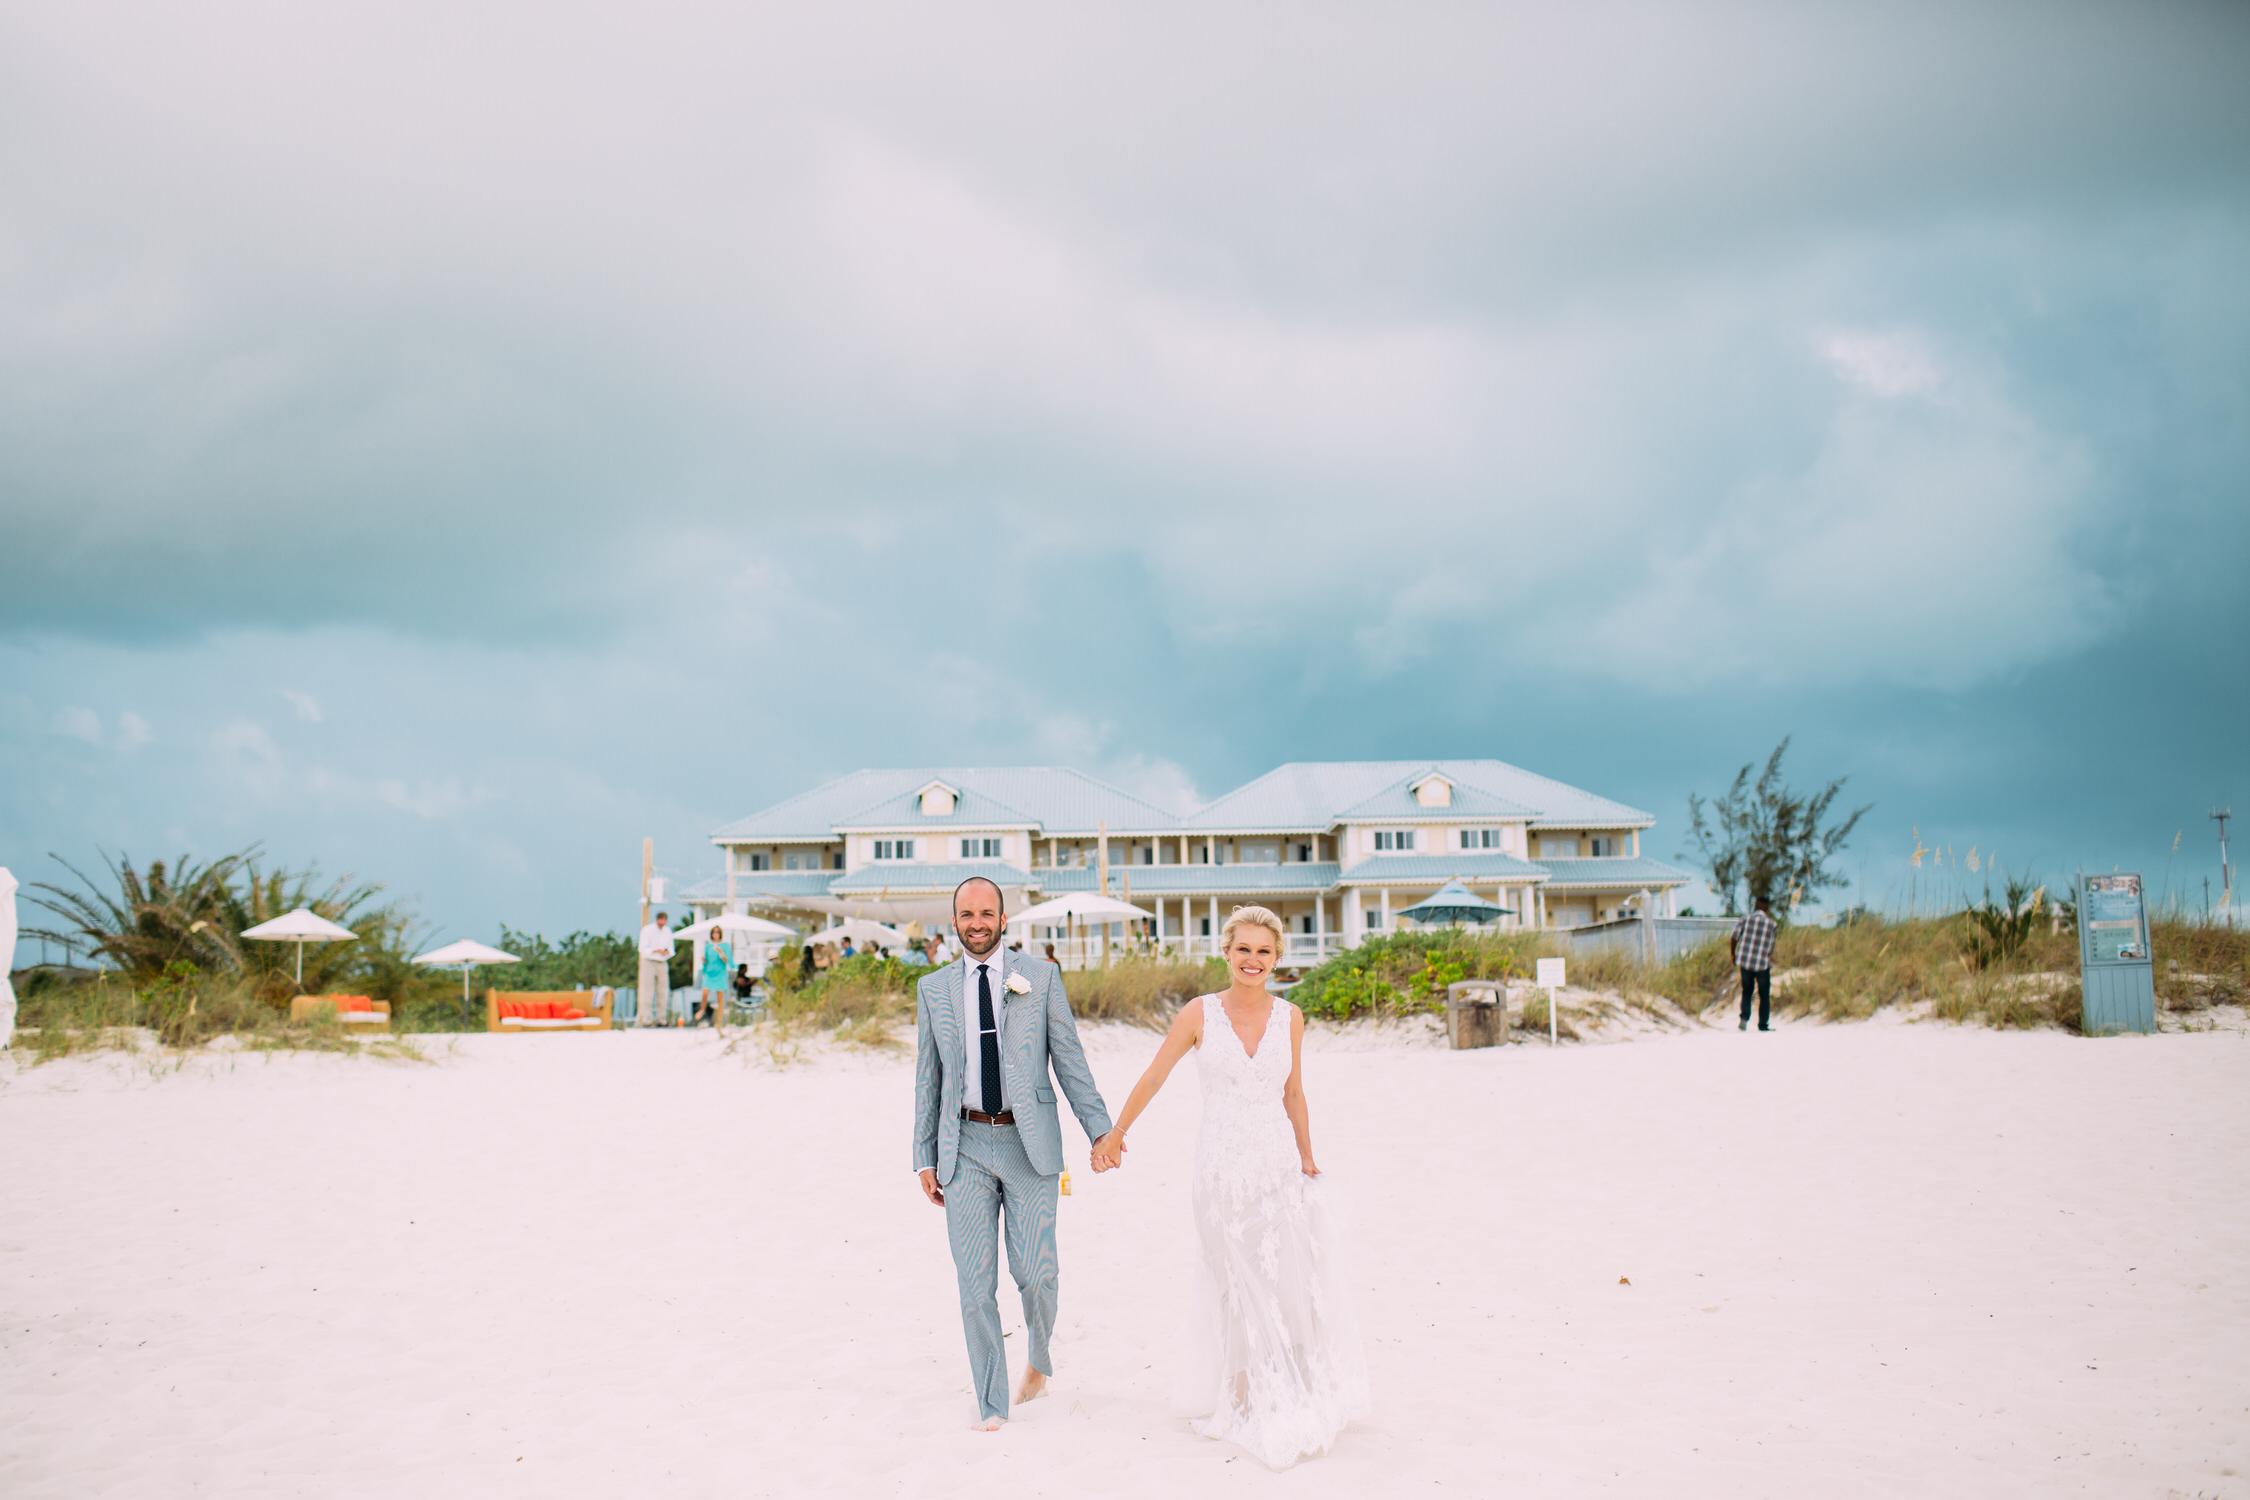 Turks and Caicos wedding, Bride and groom on the beach,